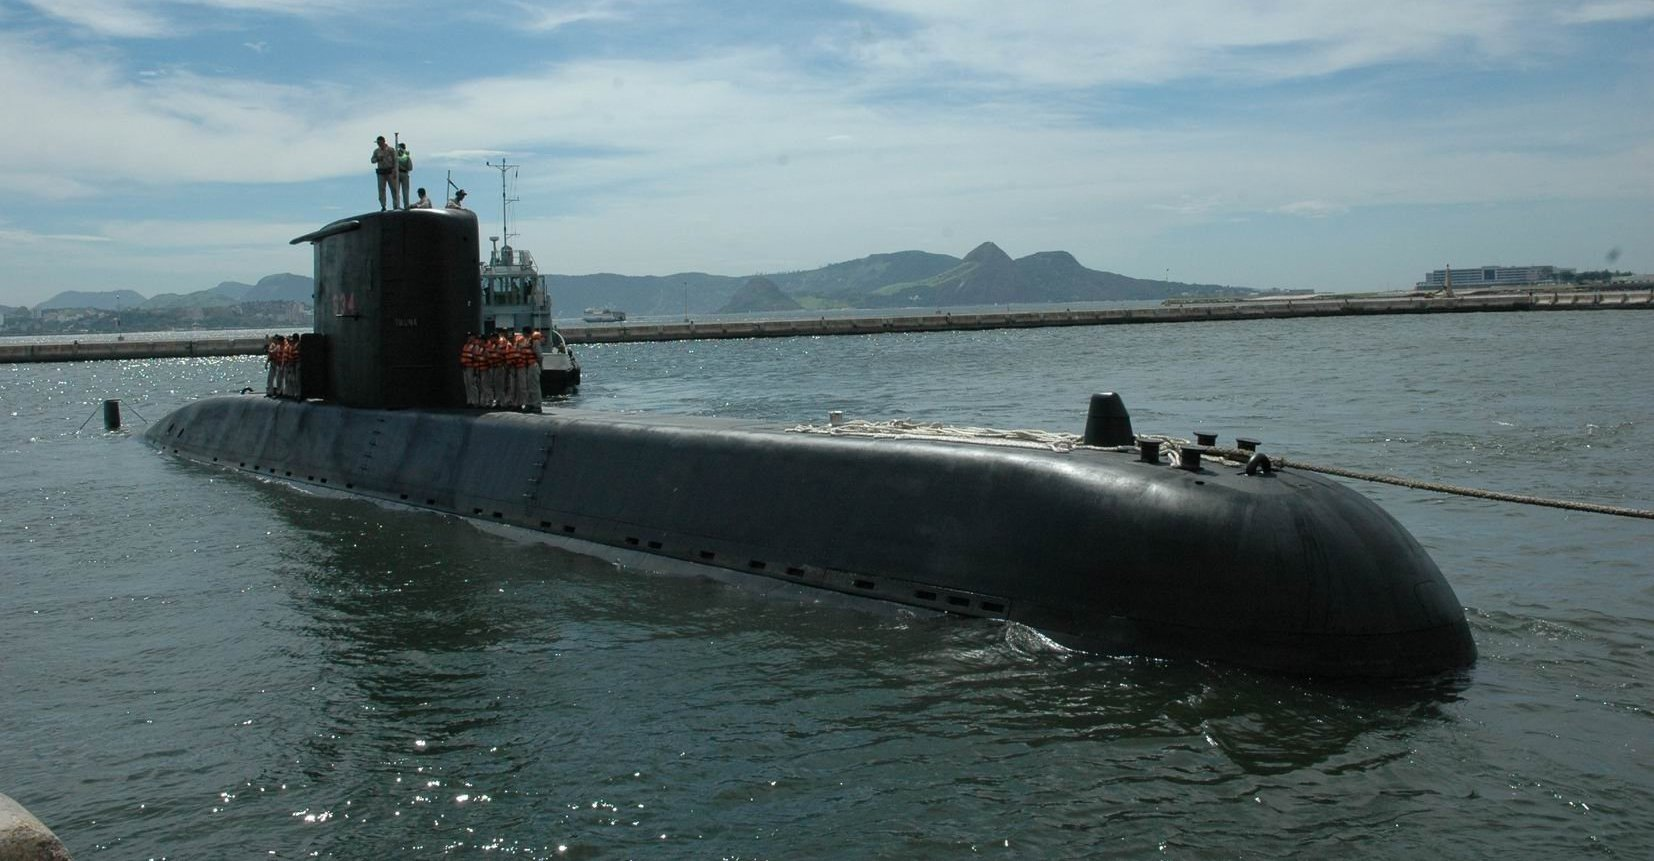 Submarino da Marinha brasileira da classe tikuna